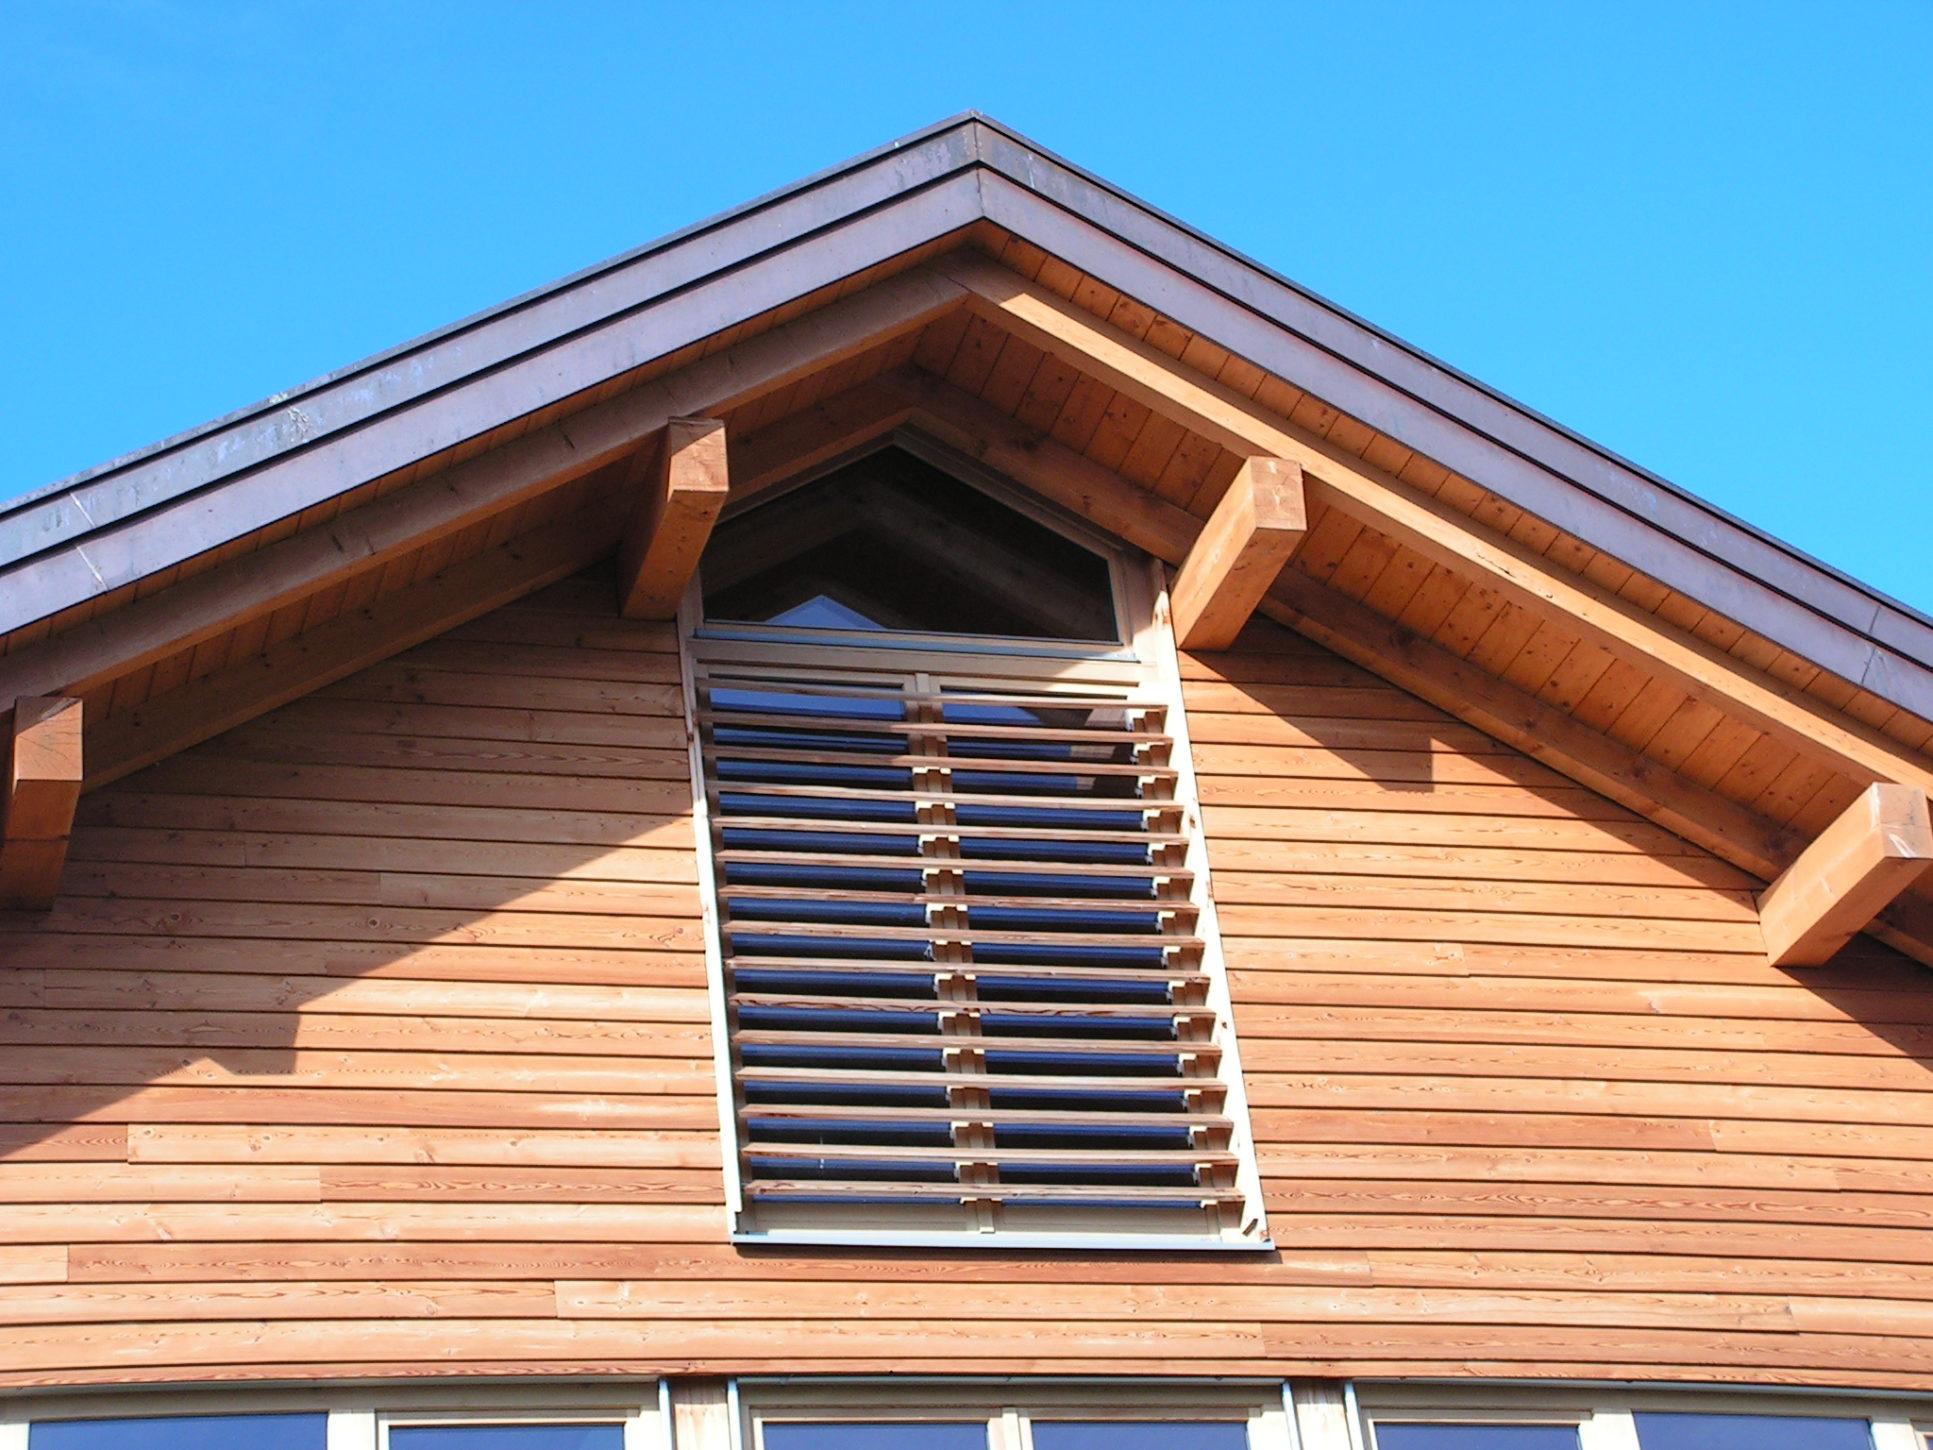 Kohaus bauen mit holz baustoff holz for Bauen mit holz